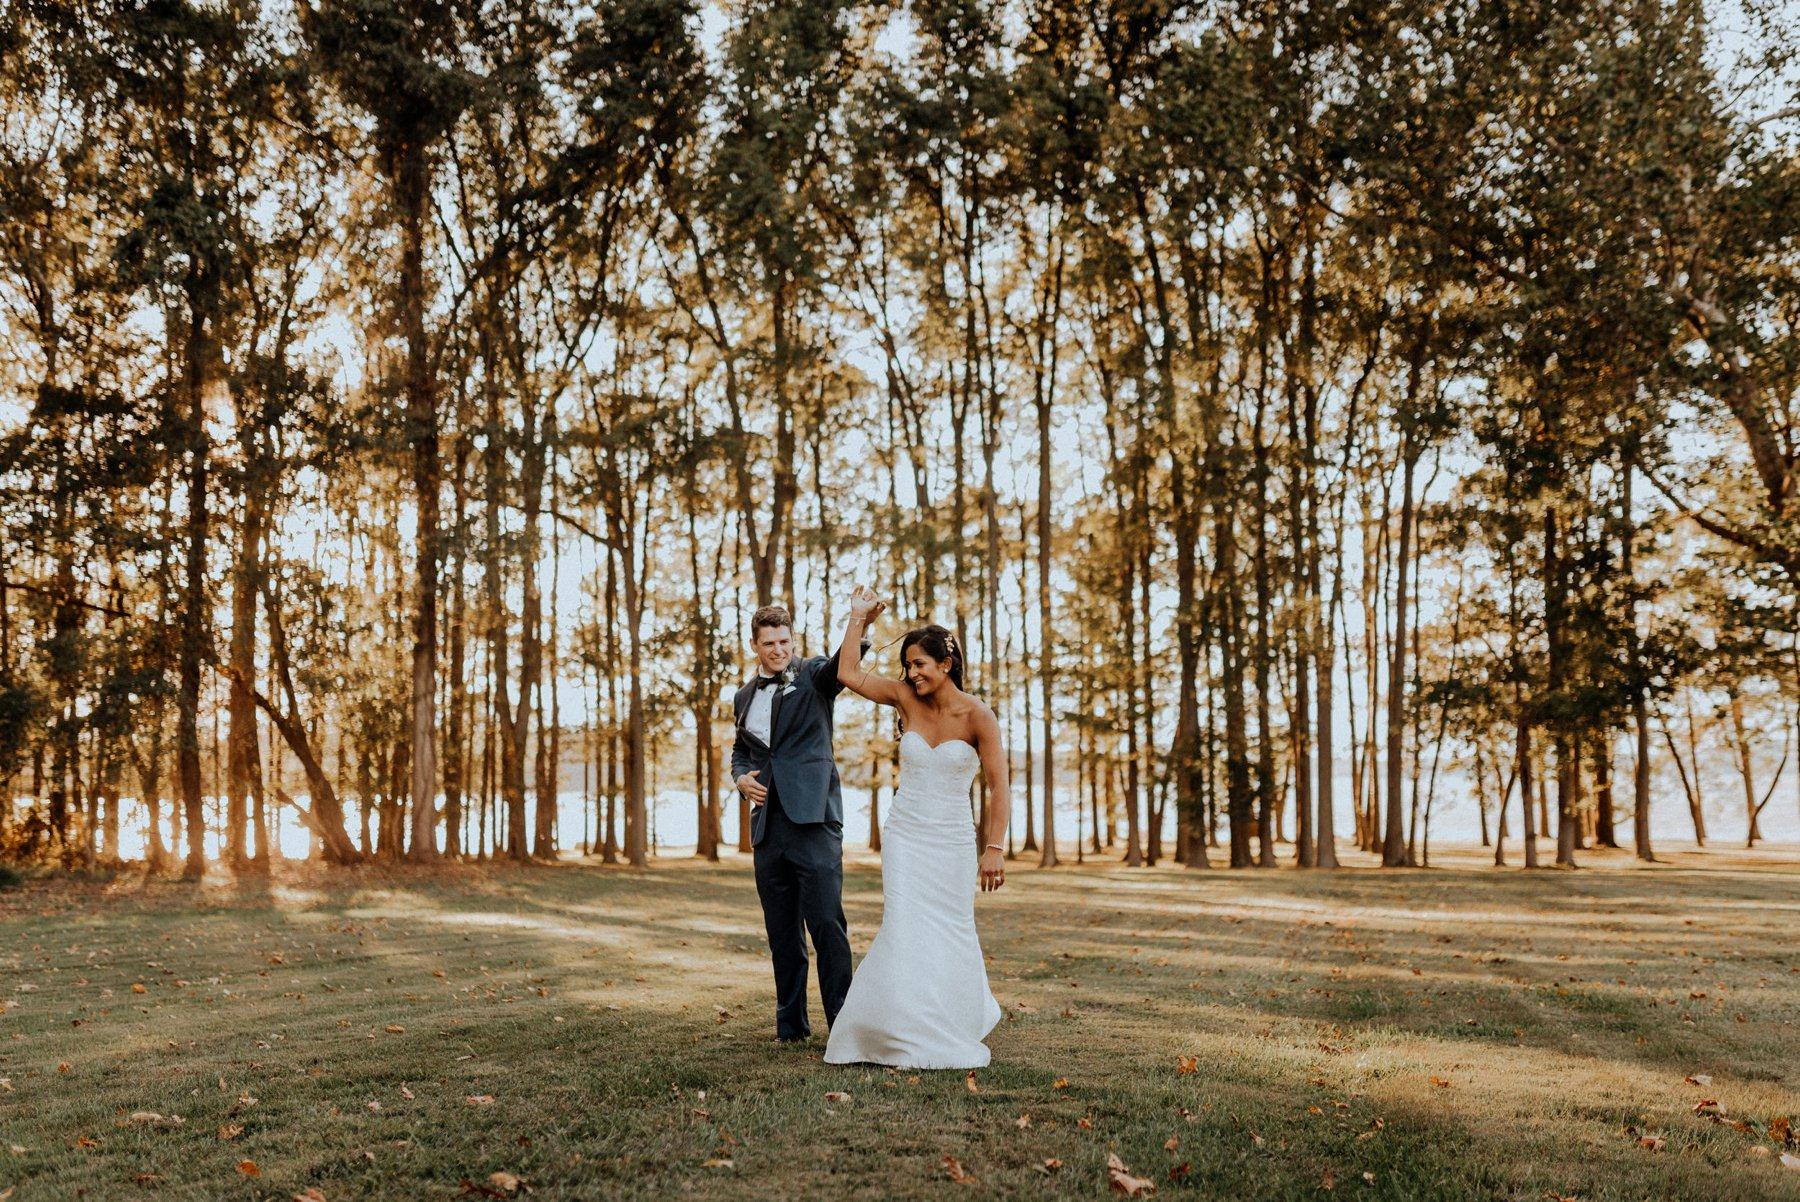 012-007-private-estate-wedding-8-2.jpg